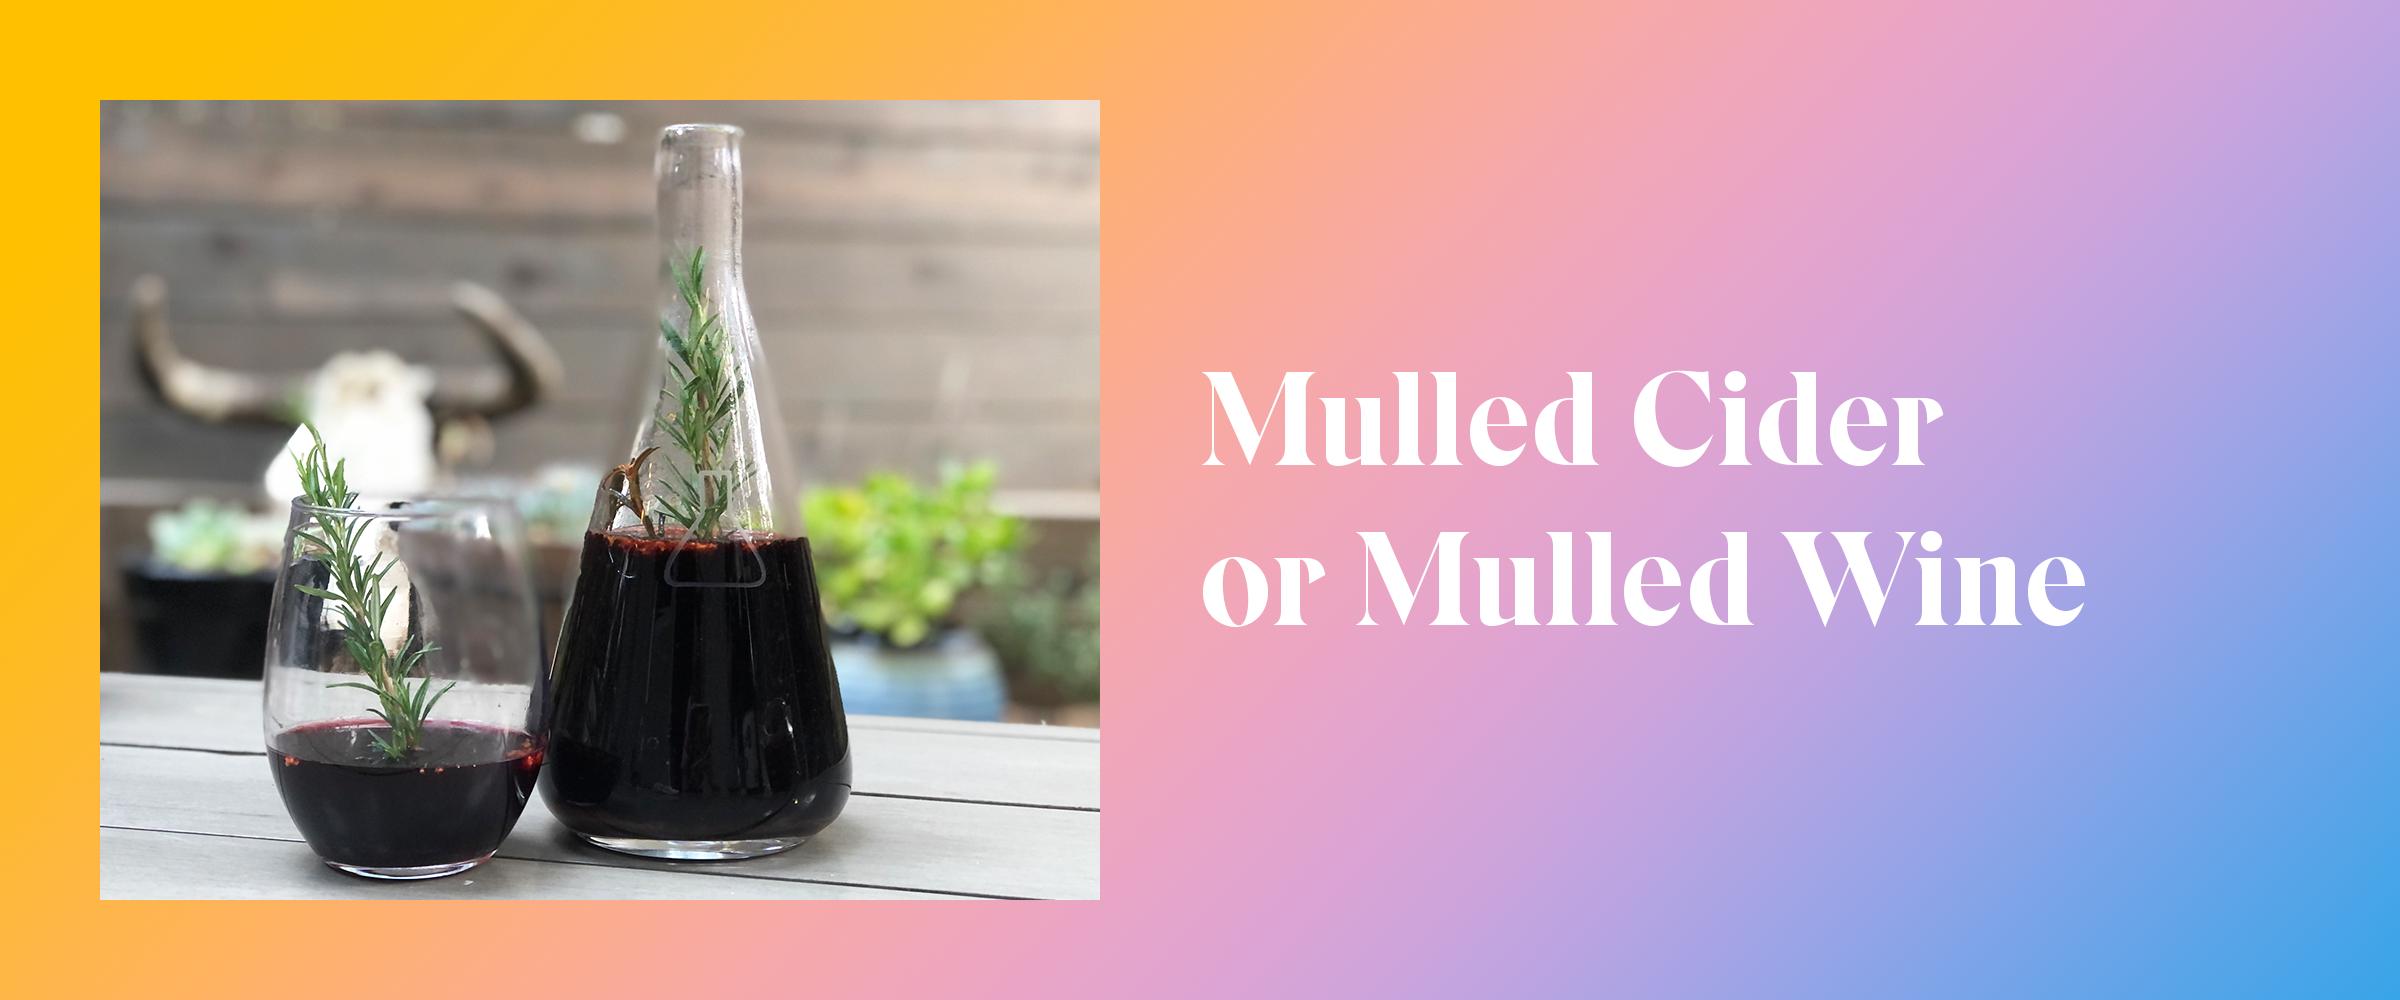 Mulled Cider or Mulled Wine